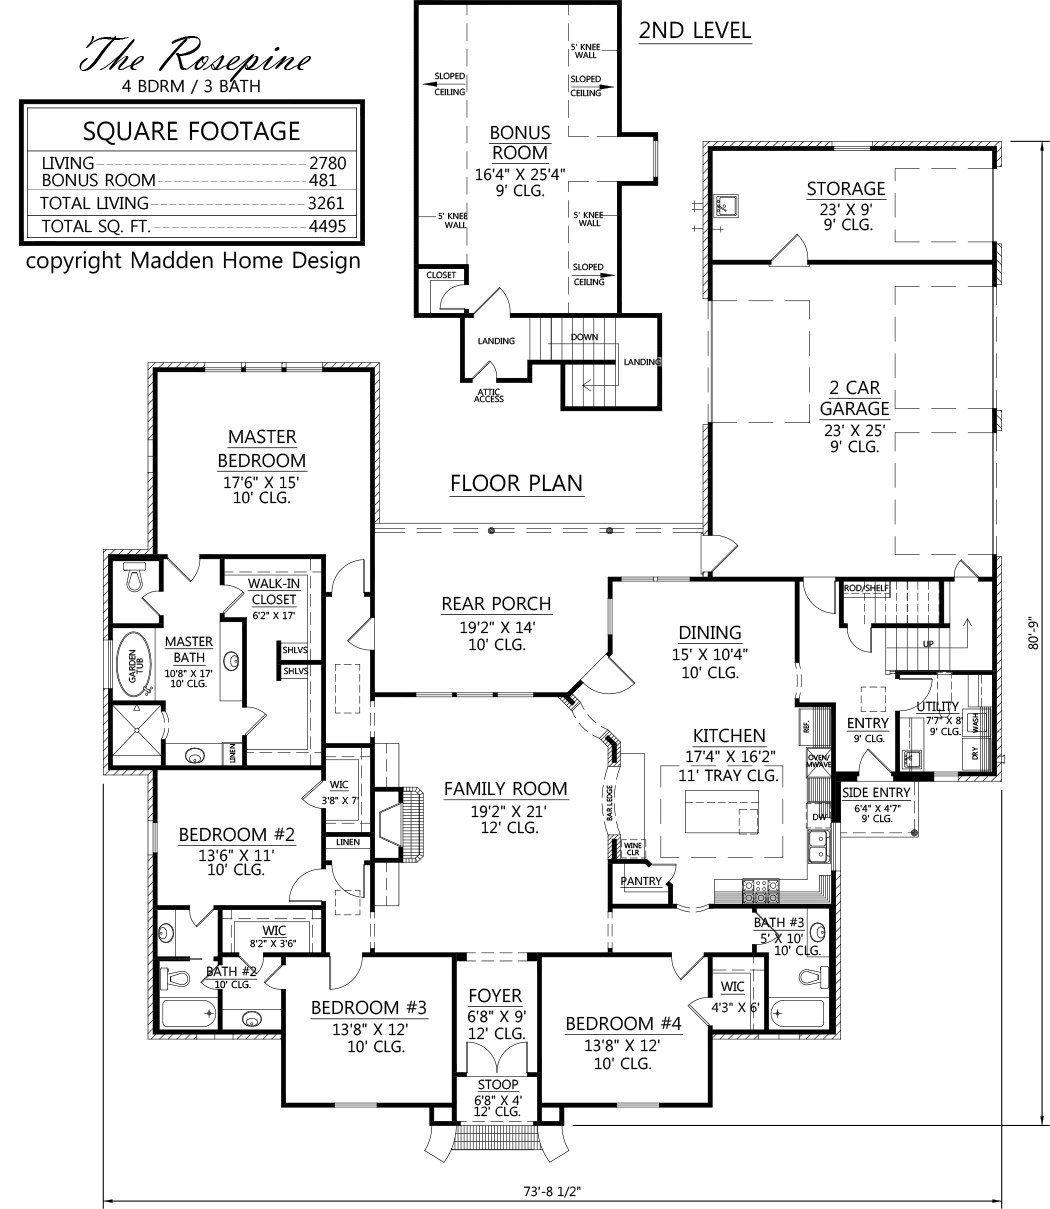 The Rosepine Madden Home Design Designer Home Plans Madden Home Design Acadian House Plans House Plans